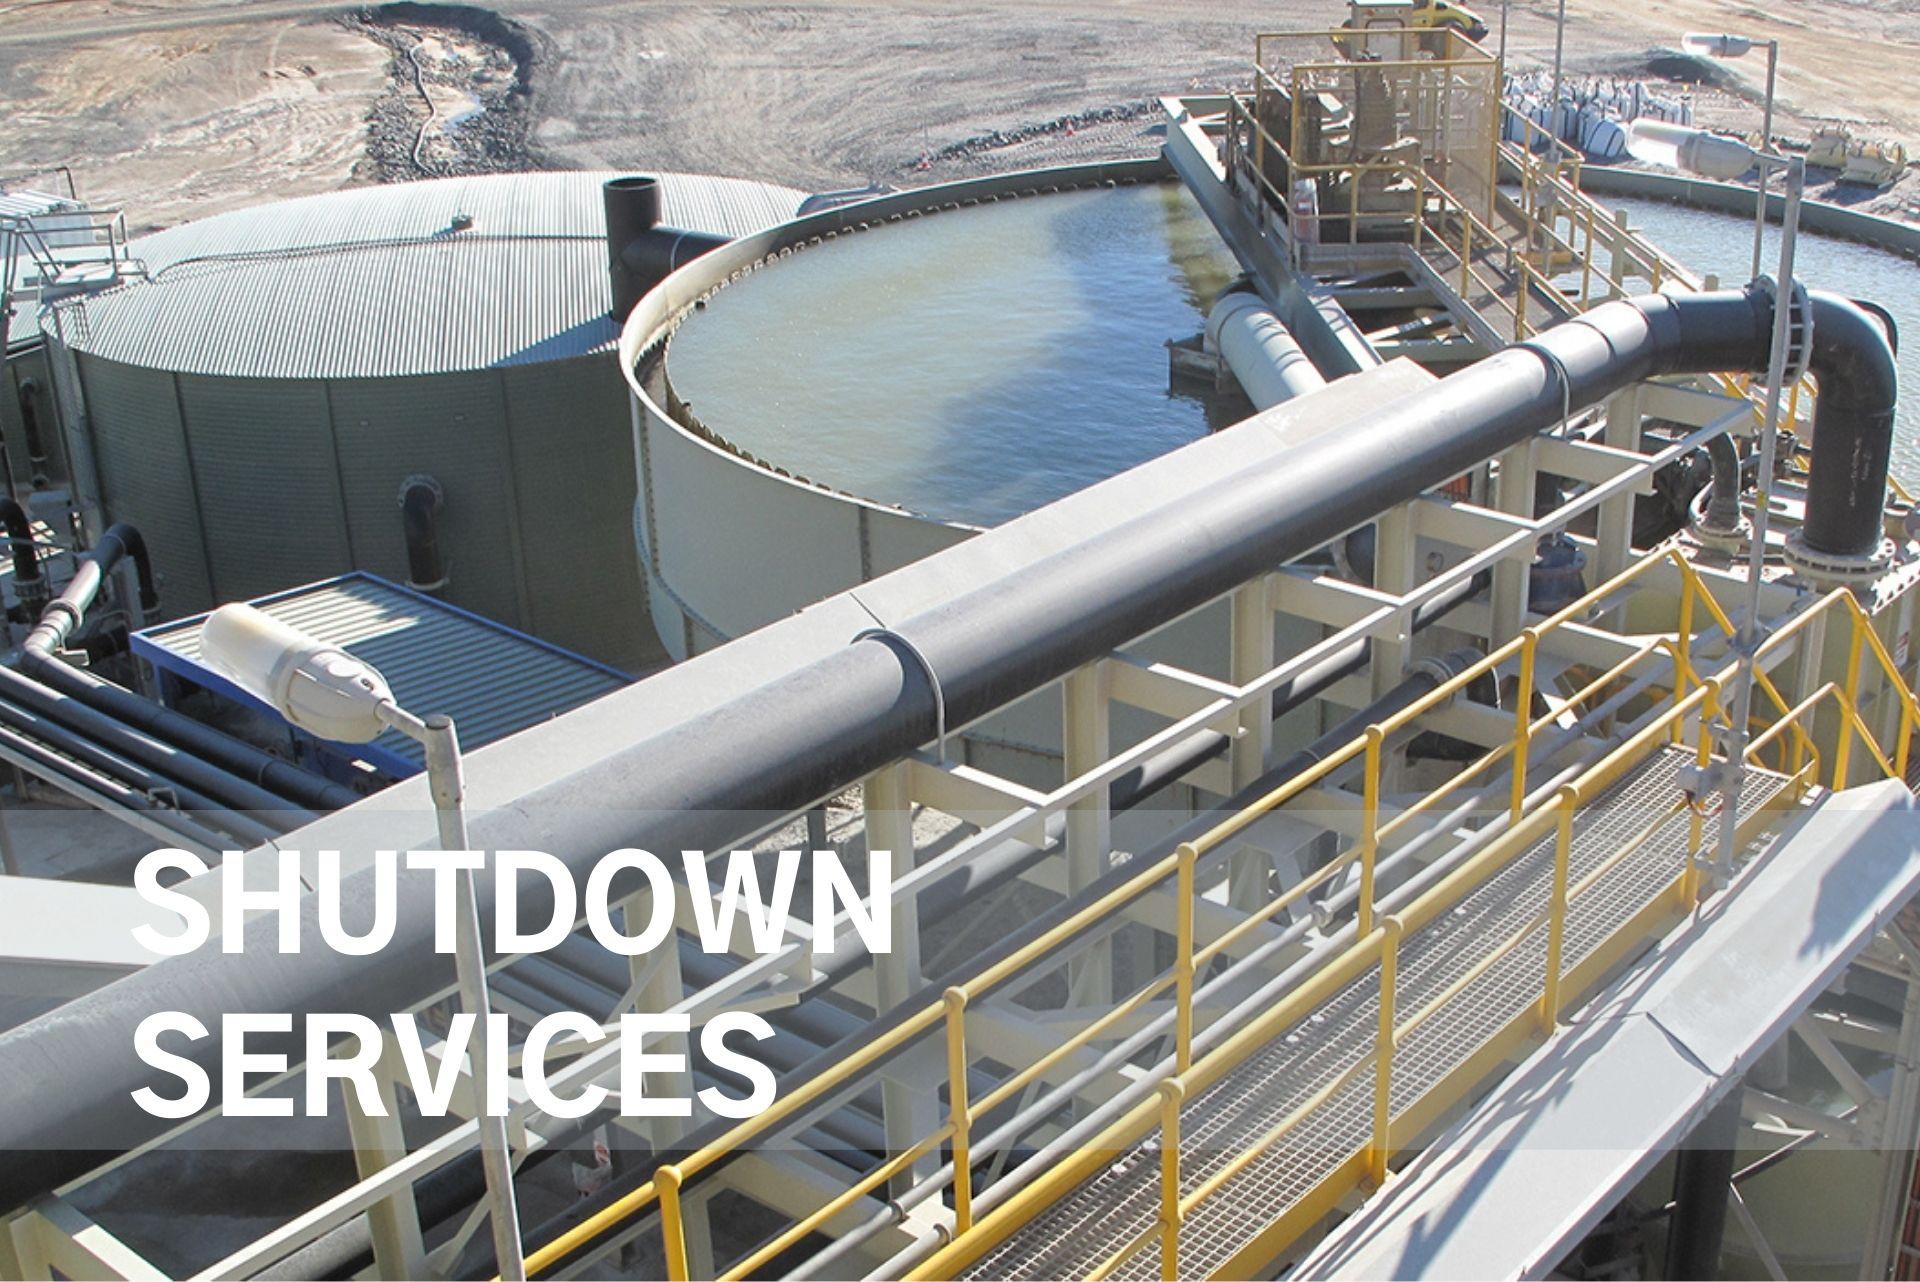 Shutdown Services